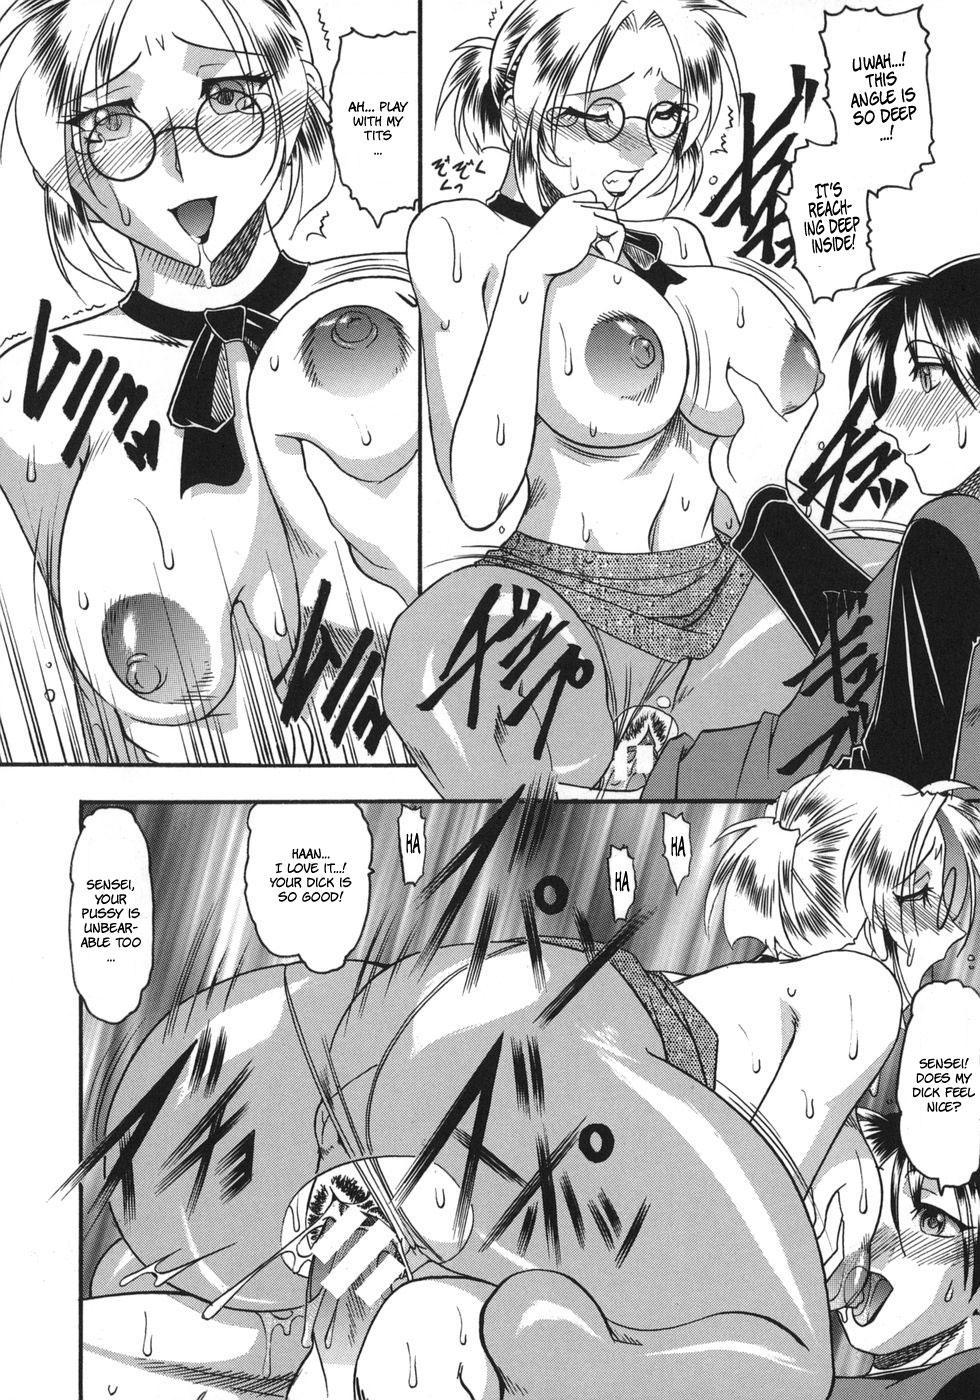 Hadaka Yori Hiwai - She is dirtier than nakedness 33